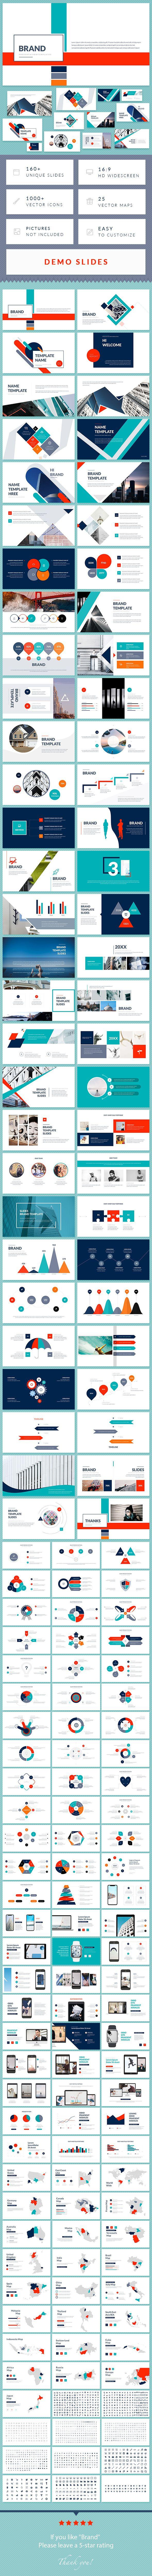 Brands Minimal Powerpoint Presentation Template 160 Unique